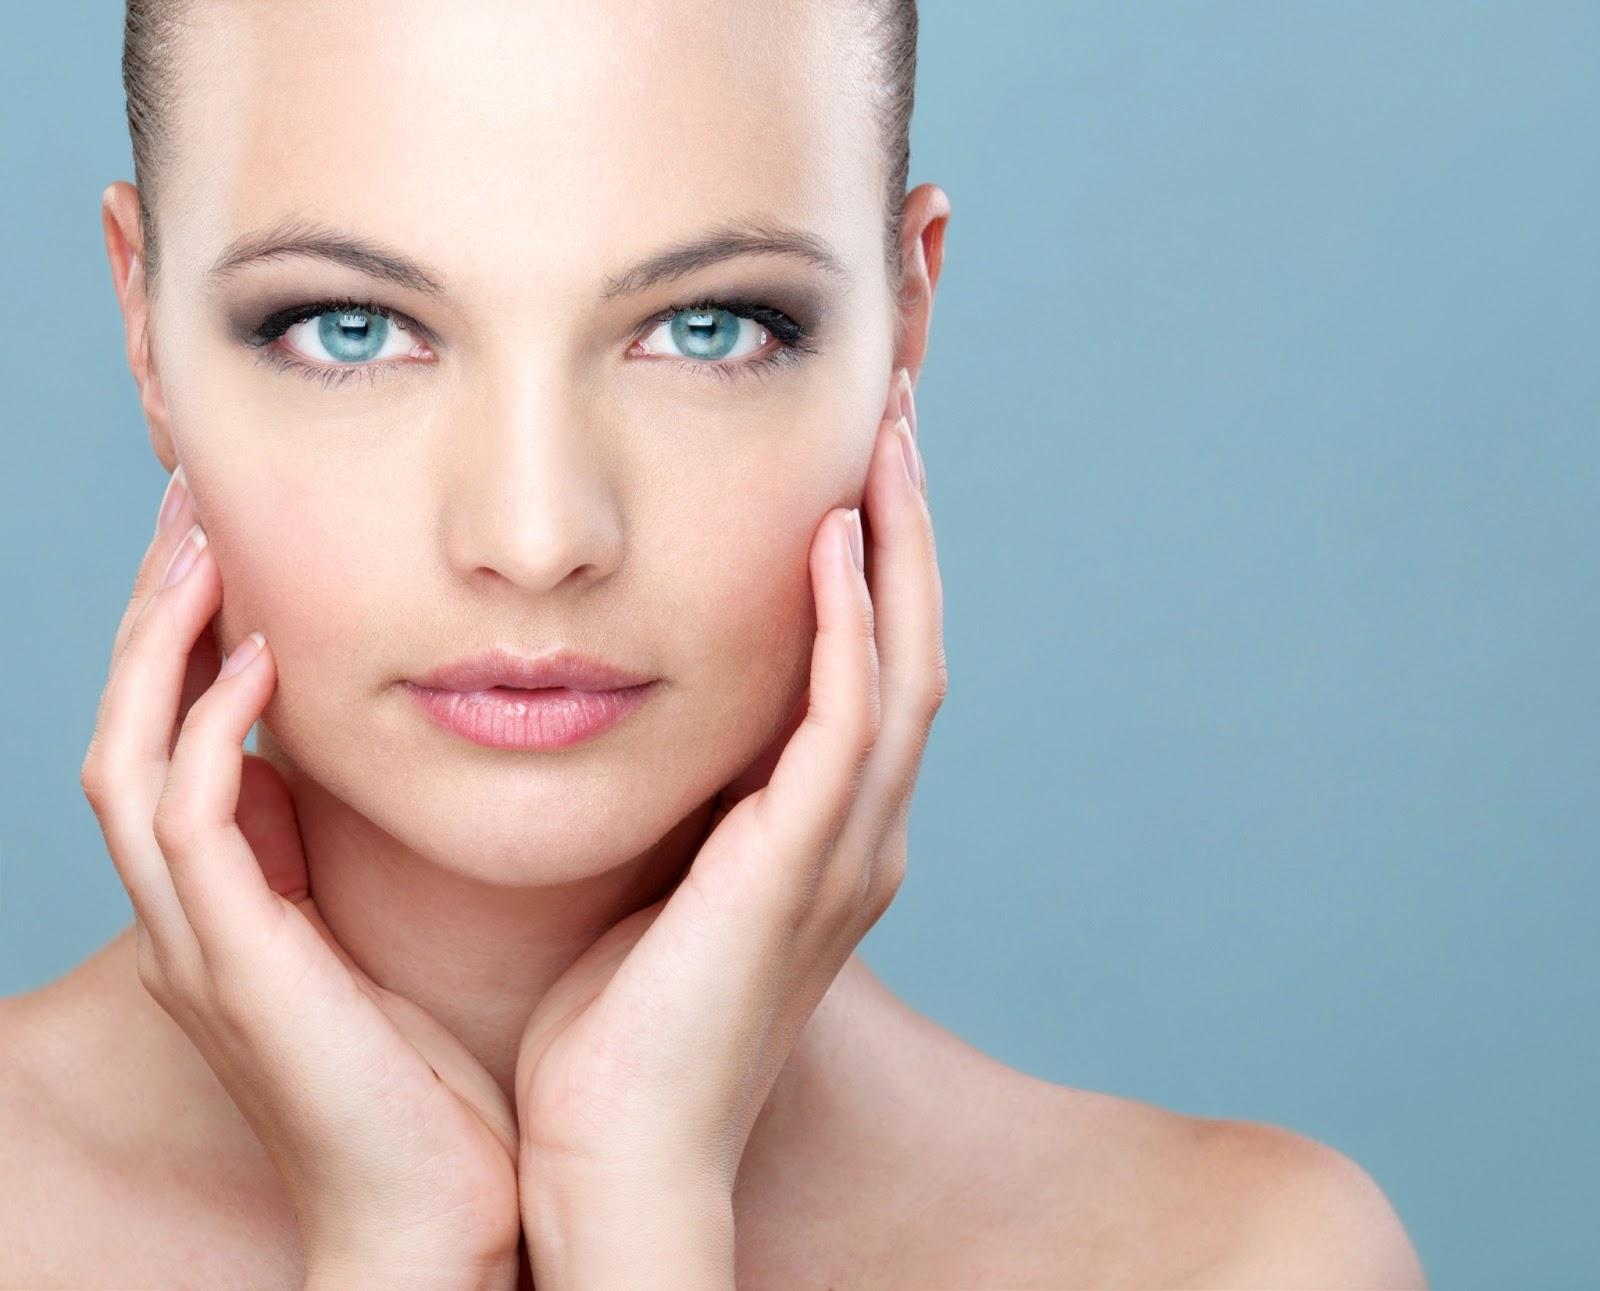 How to Get High Cheek Bones, Chin Implants Treatment ...